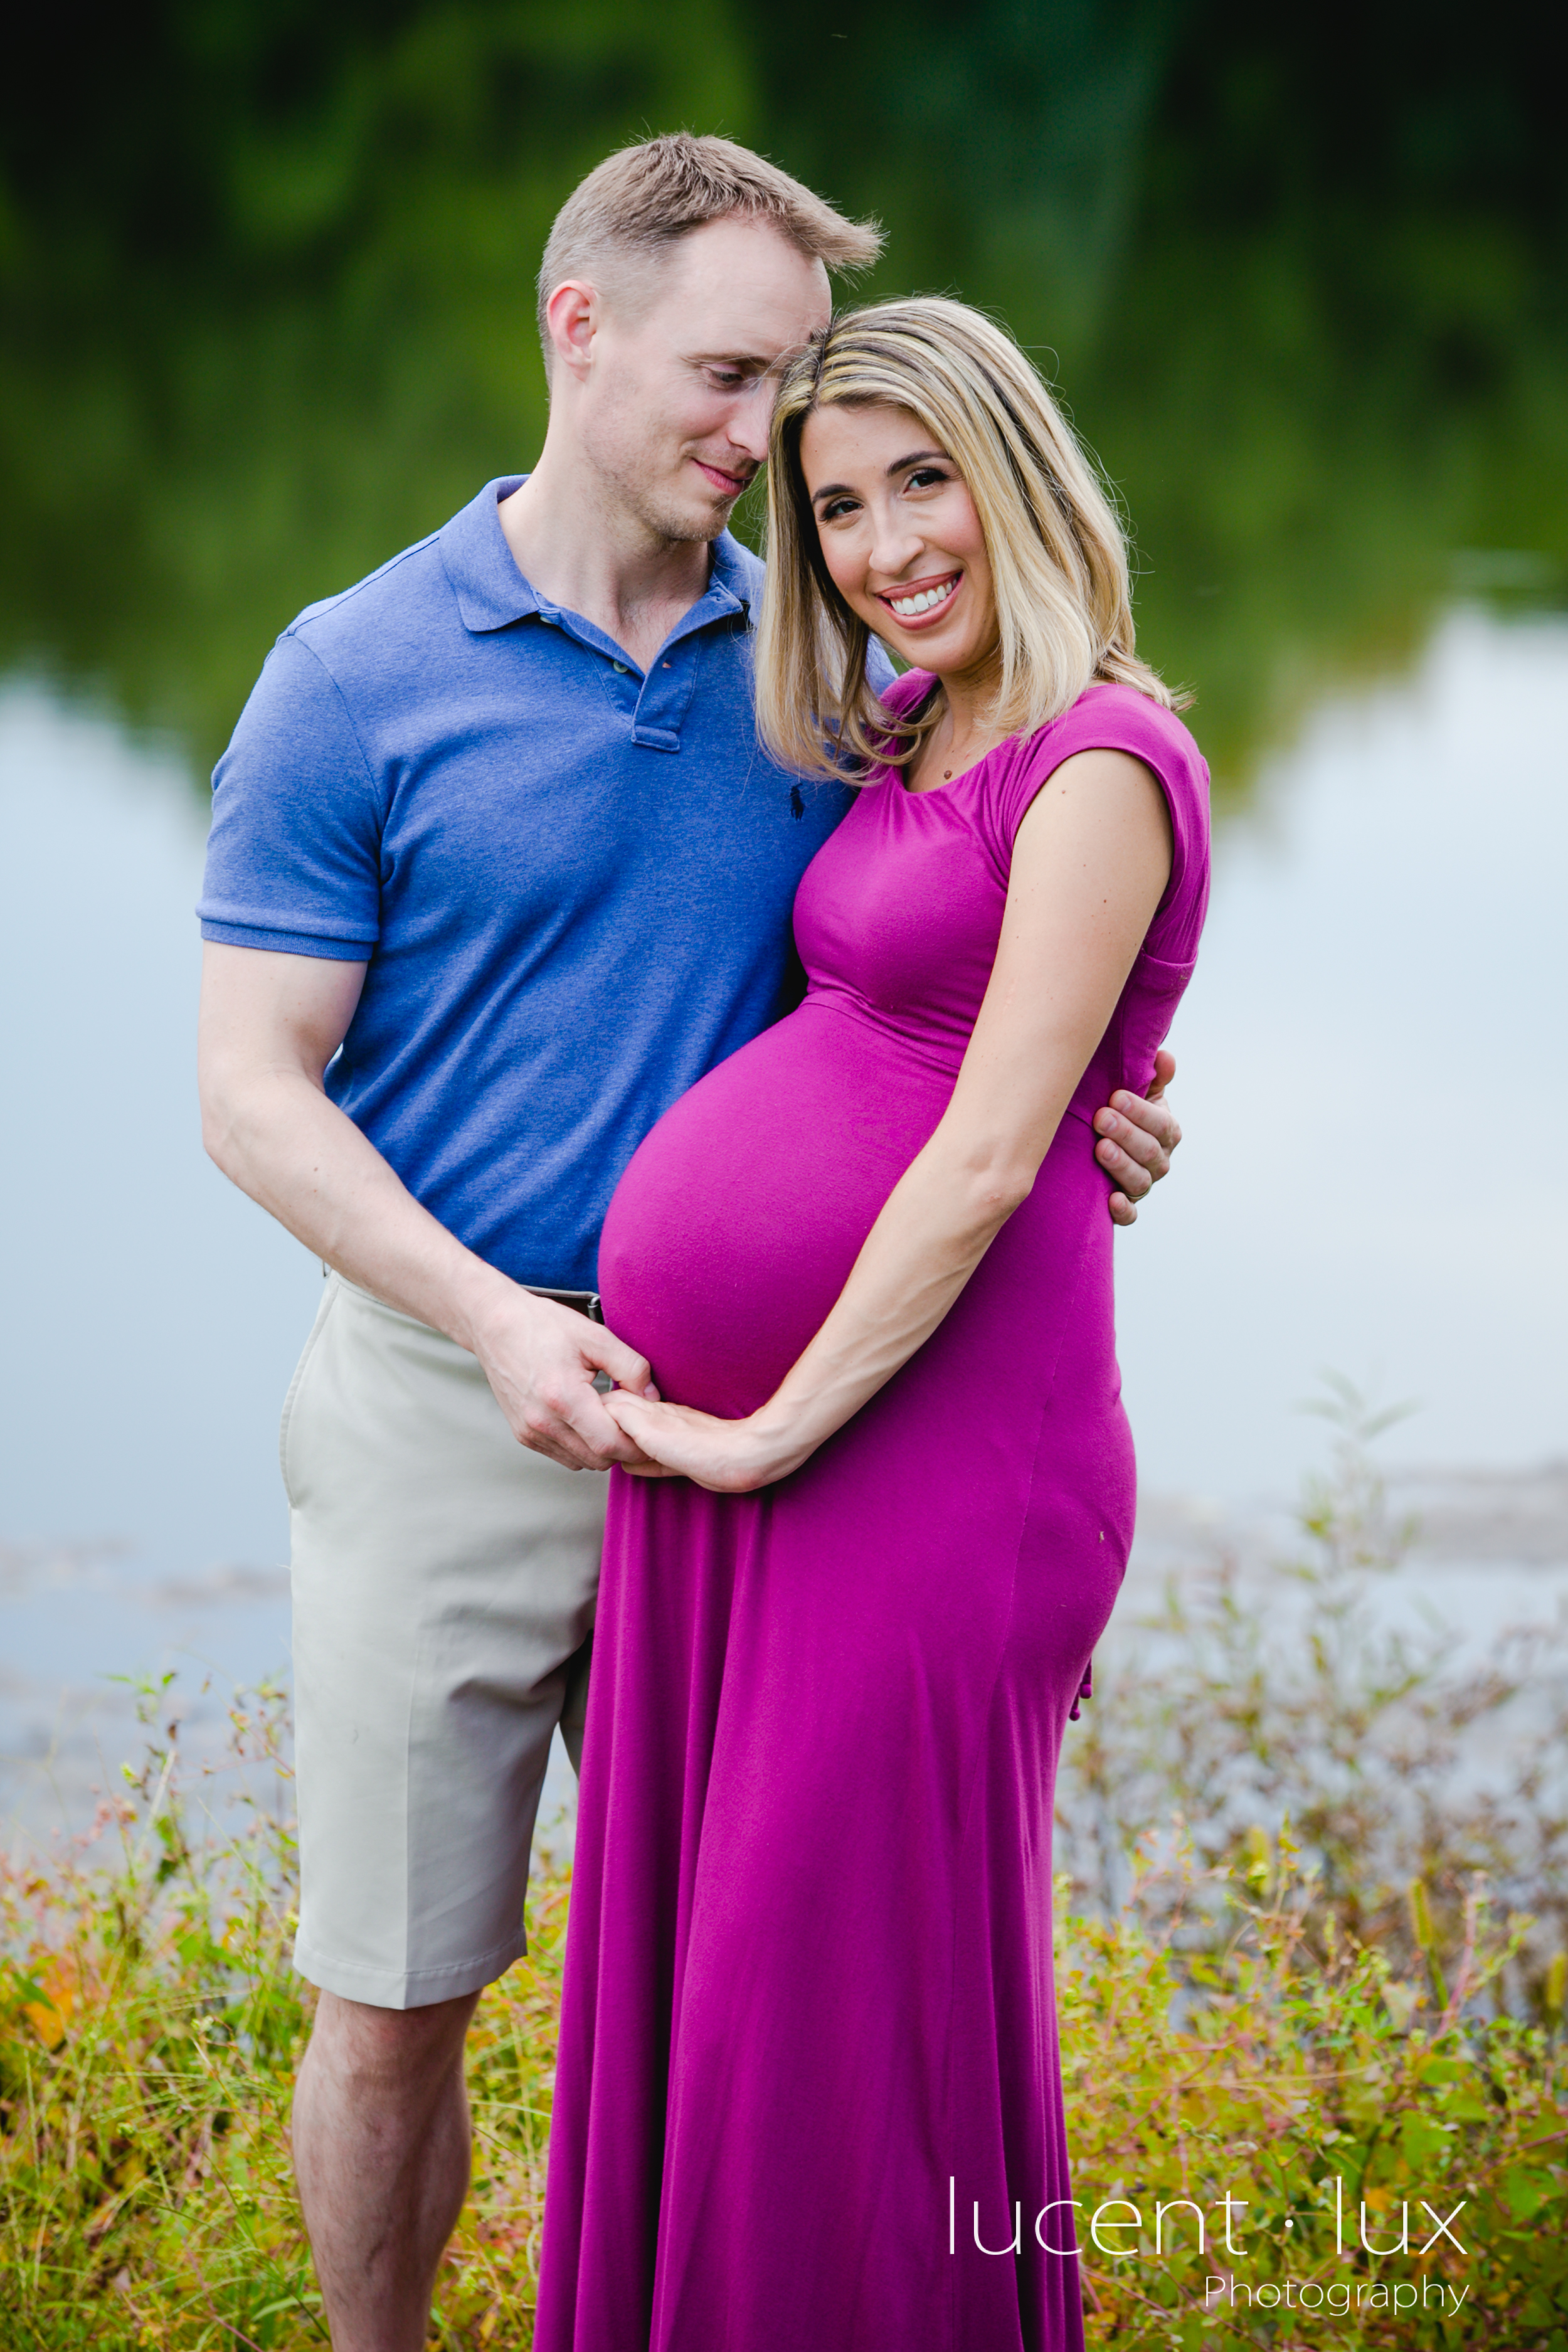 Maternity-Photography-Maryland-Baltimore-Photographer-Family-Portraits-Couple-Engagement-Newborn-104.jpg